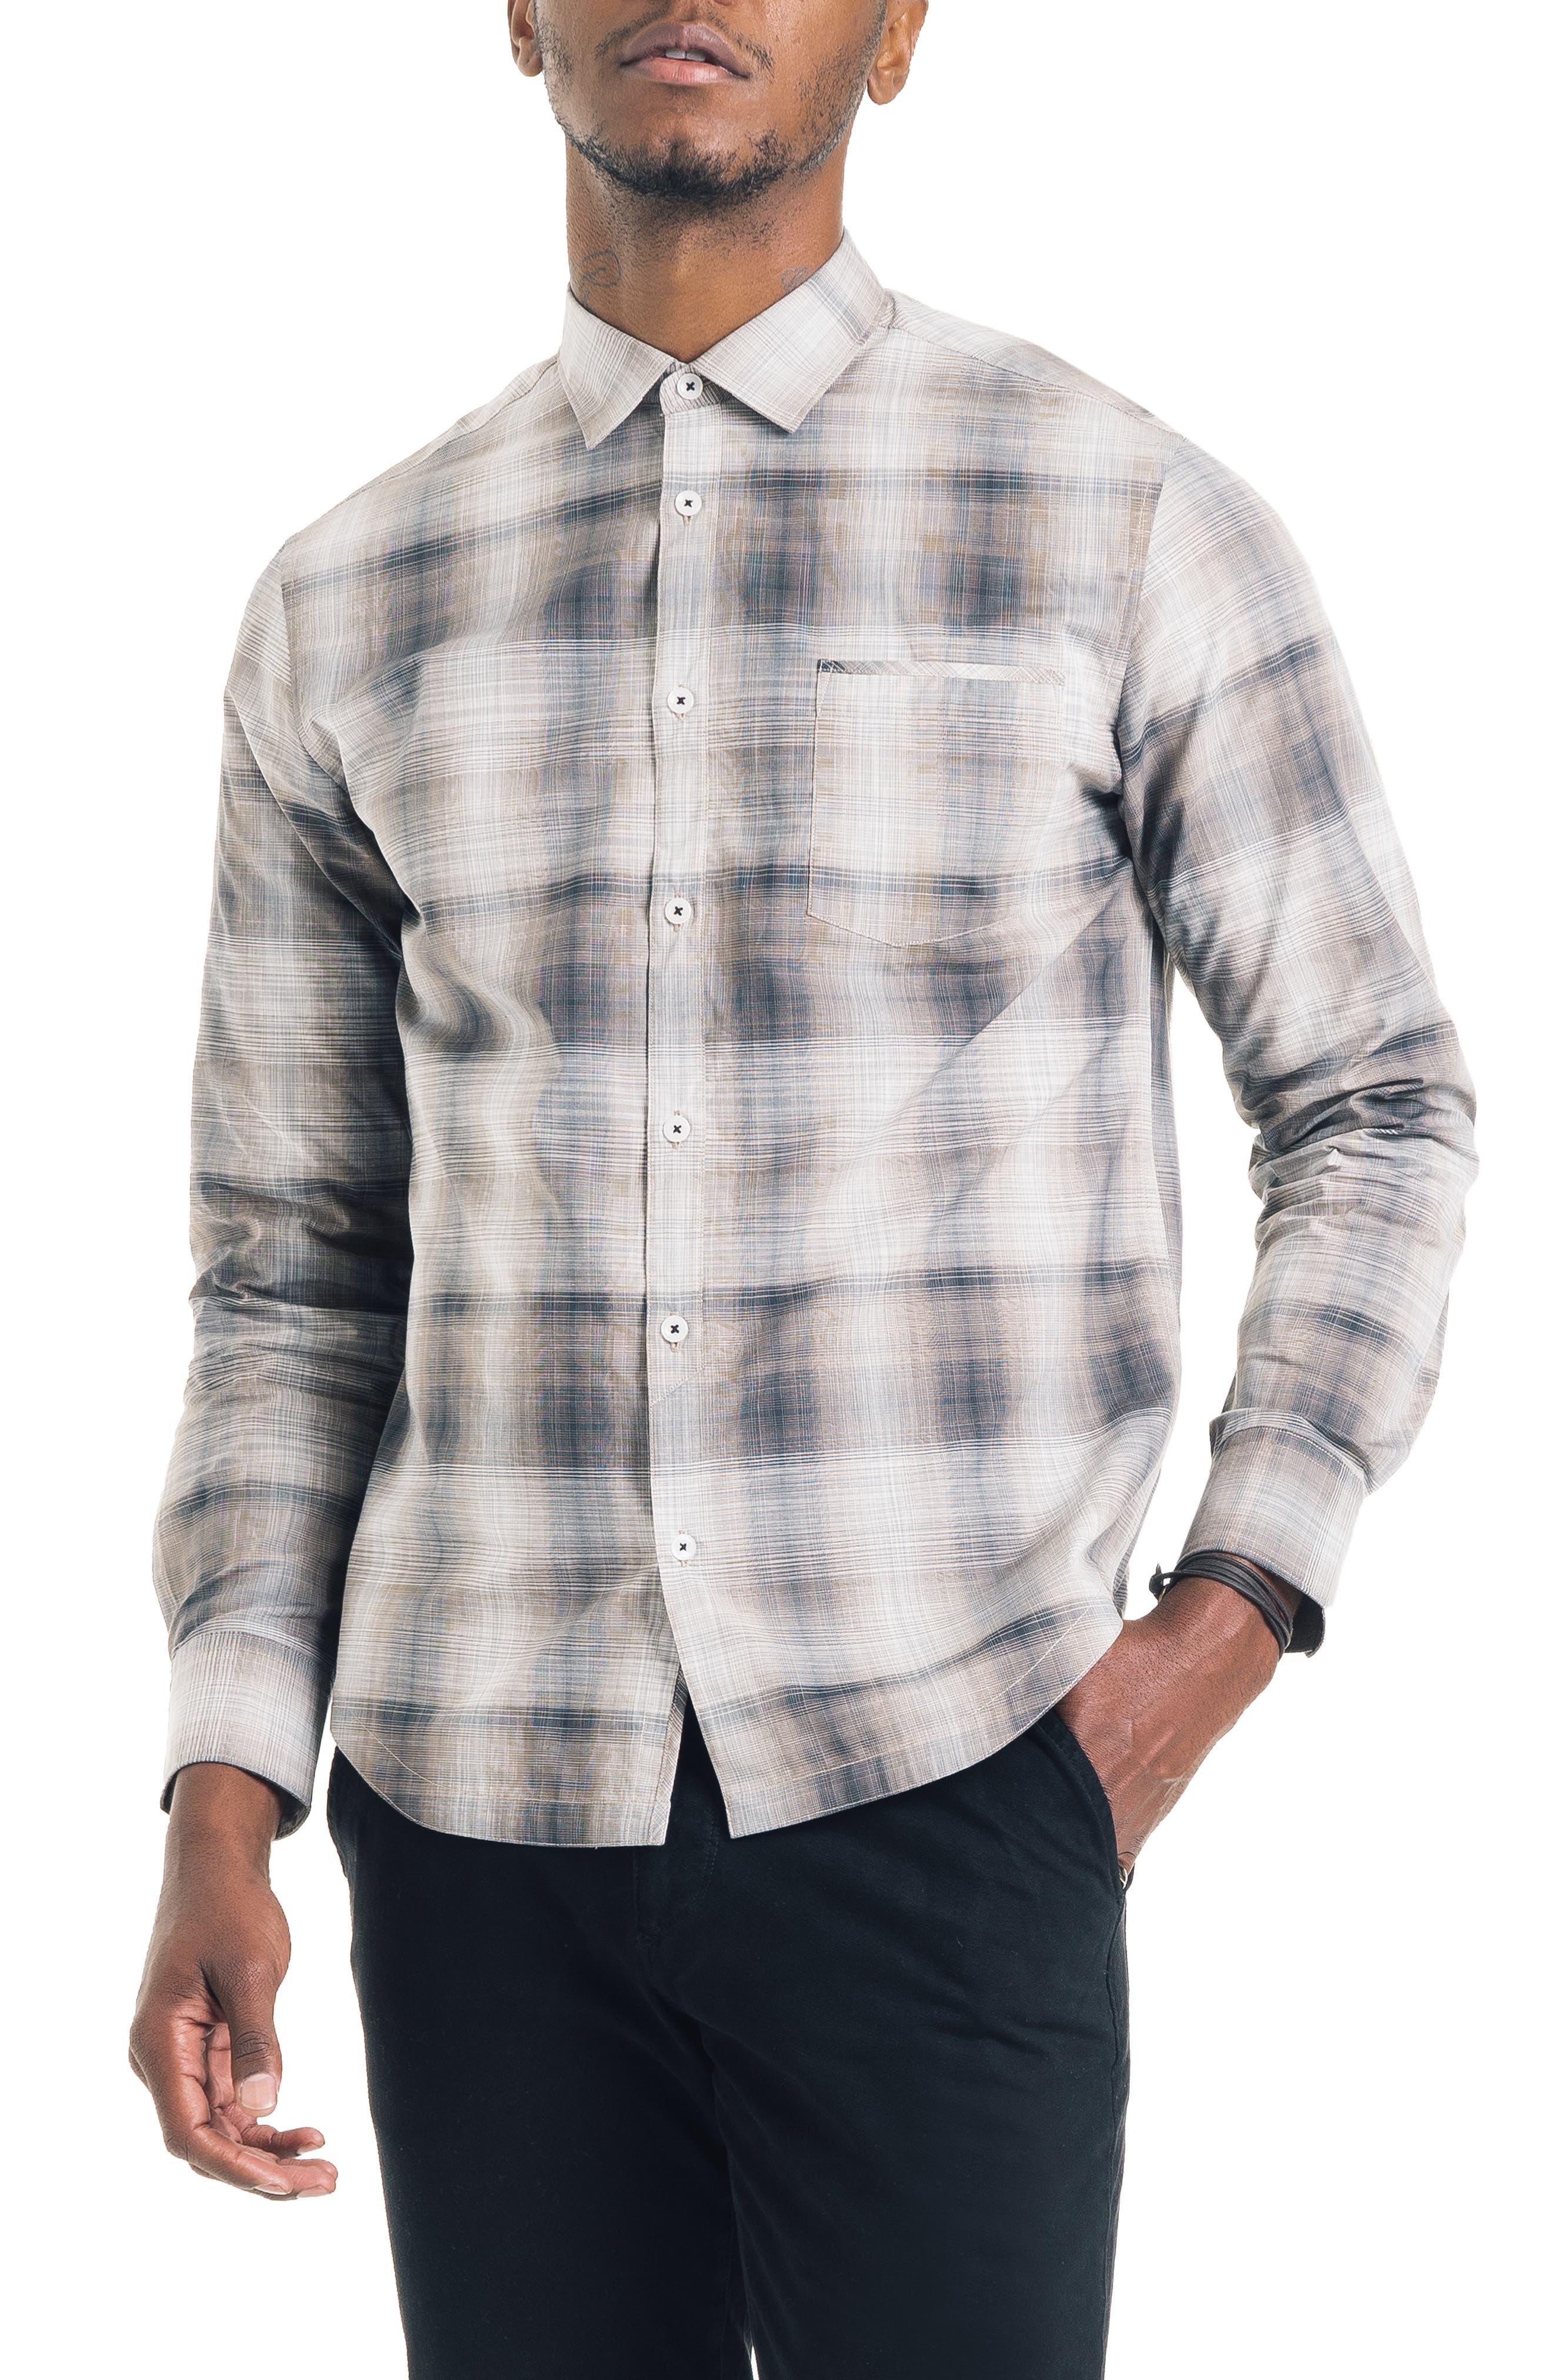 Hamachi Slim Fit Plaid Sport Shirt,                             Main thumbnail 1, color,                             DESERT